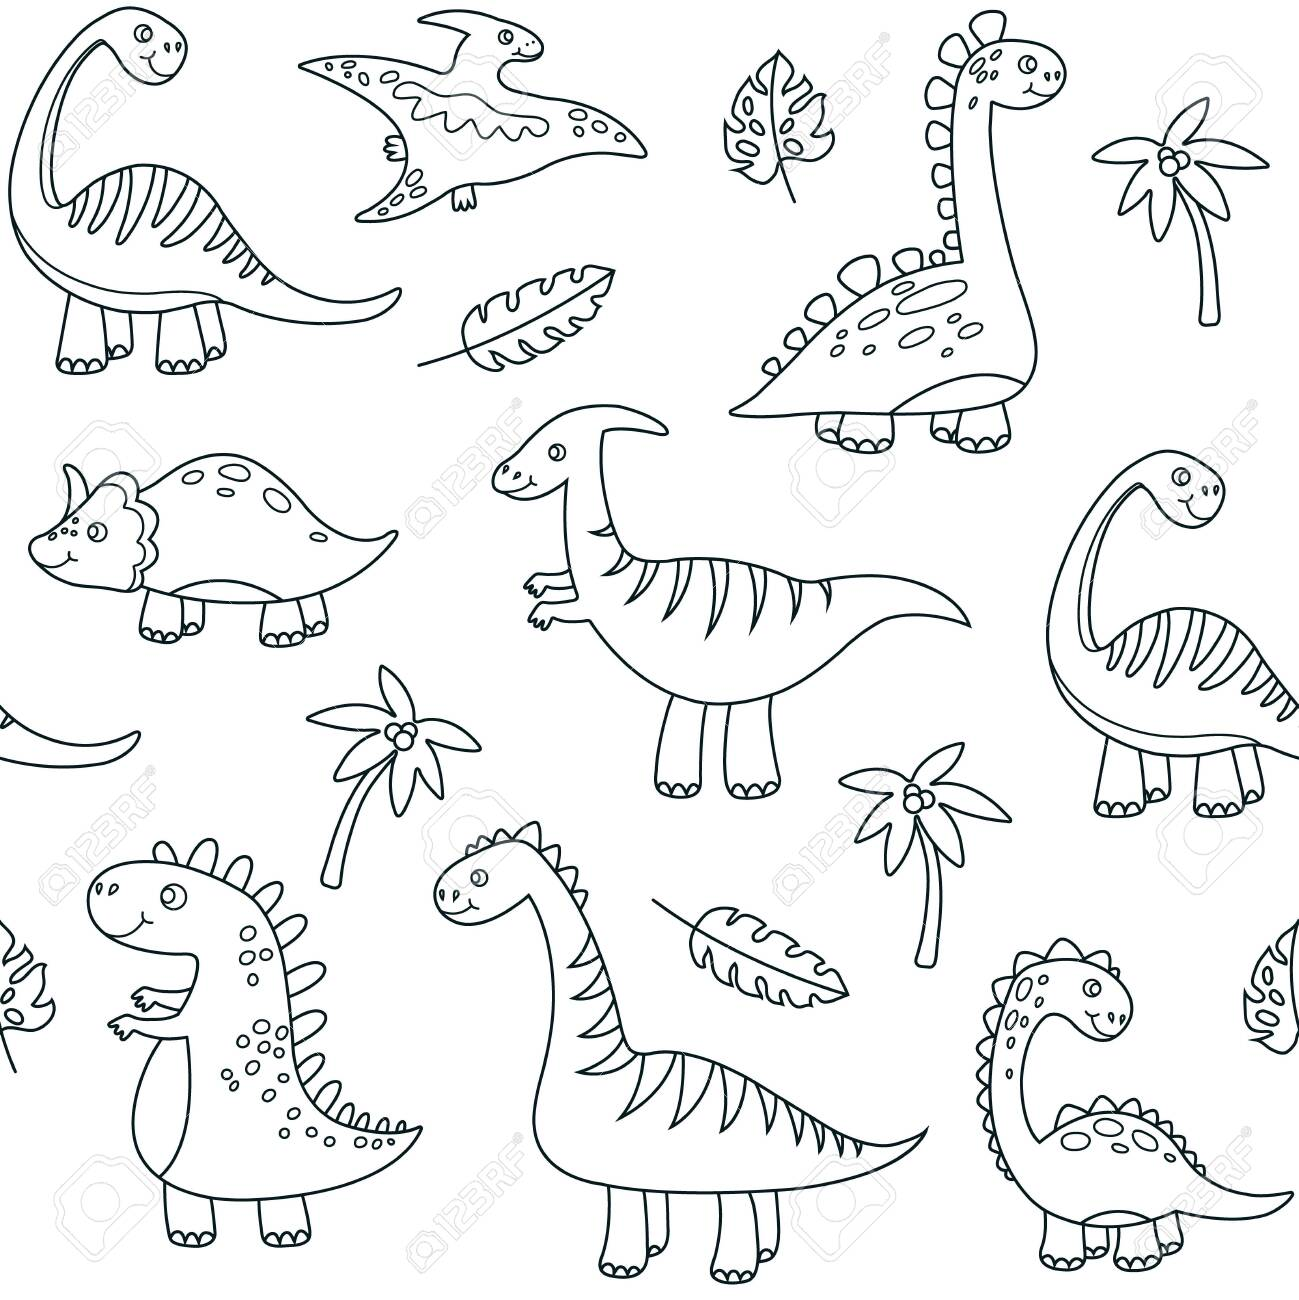 Dinosaur Outline Seamless Pattern Cute Baby Dino Funny Brontosaurus